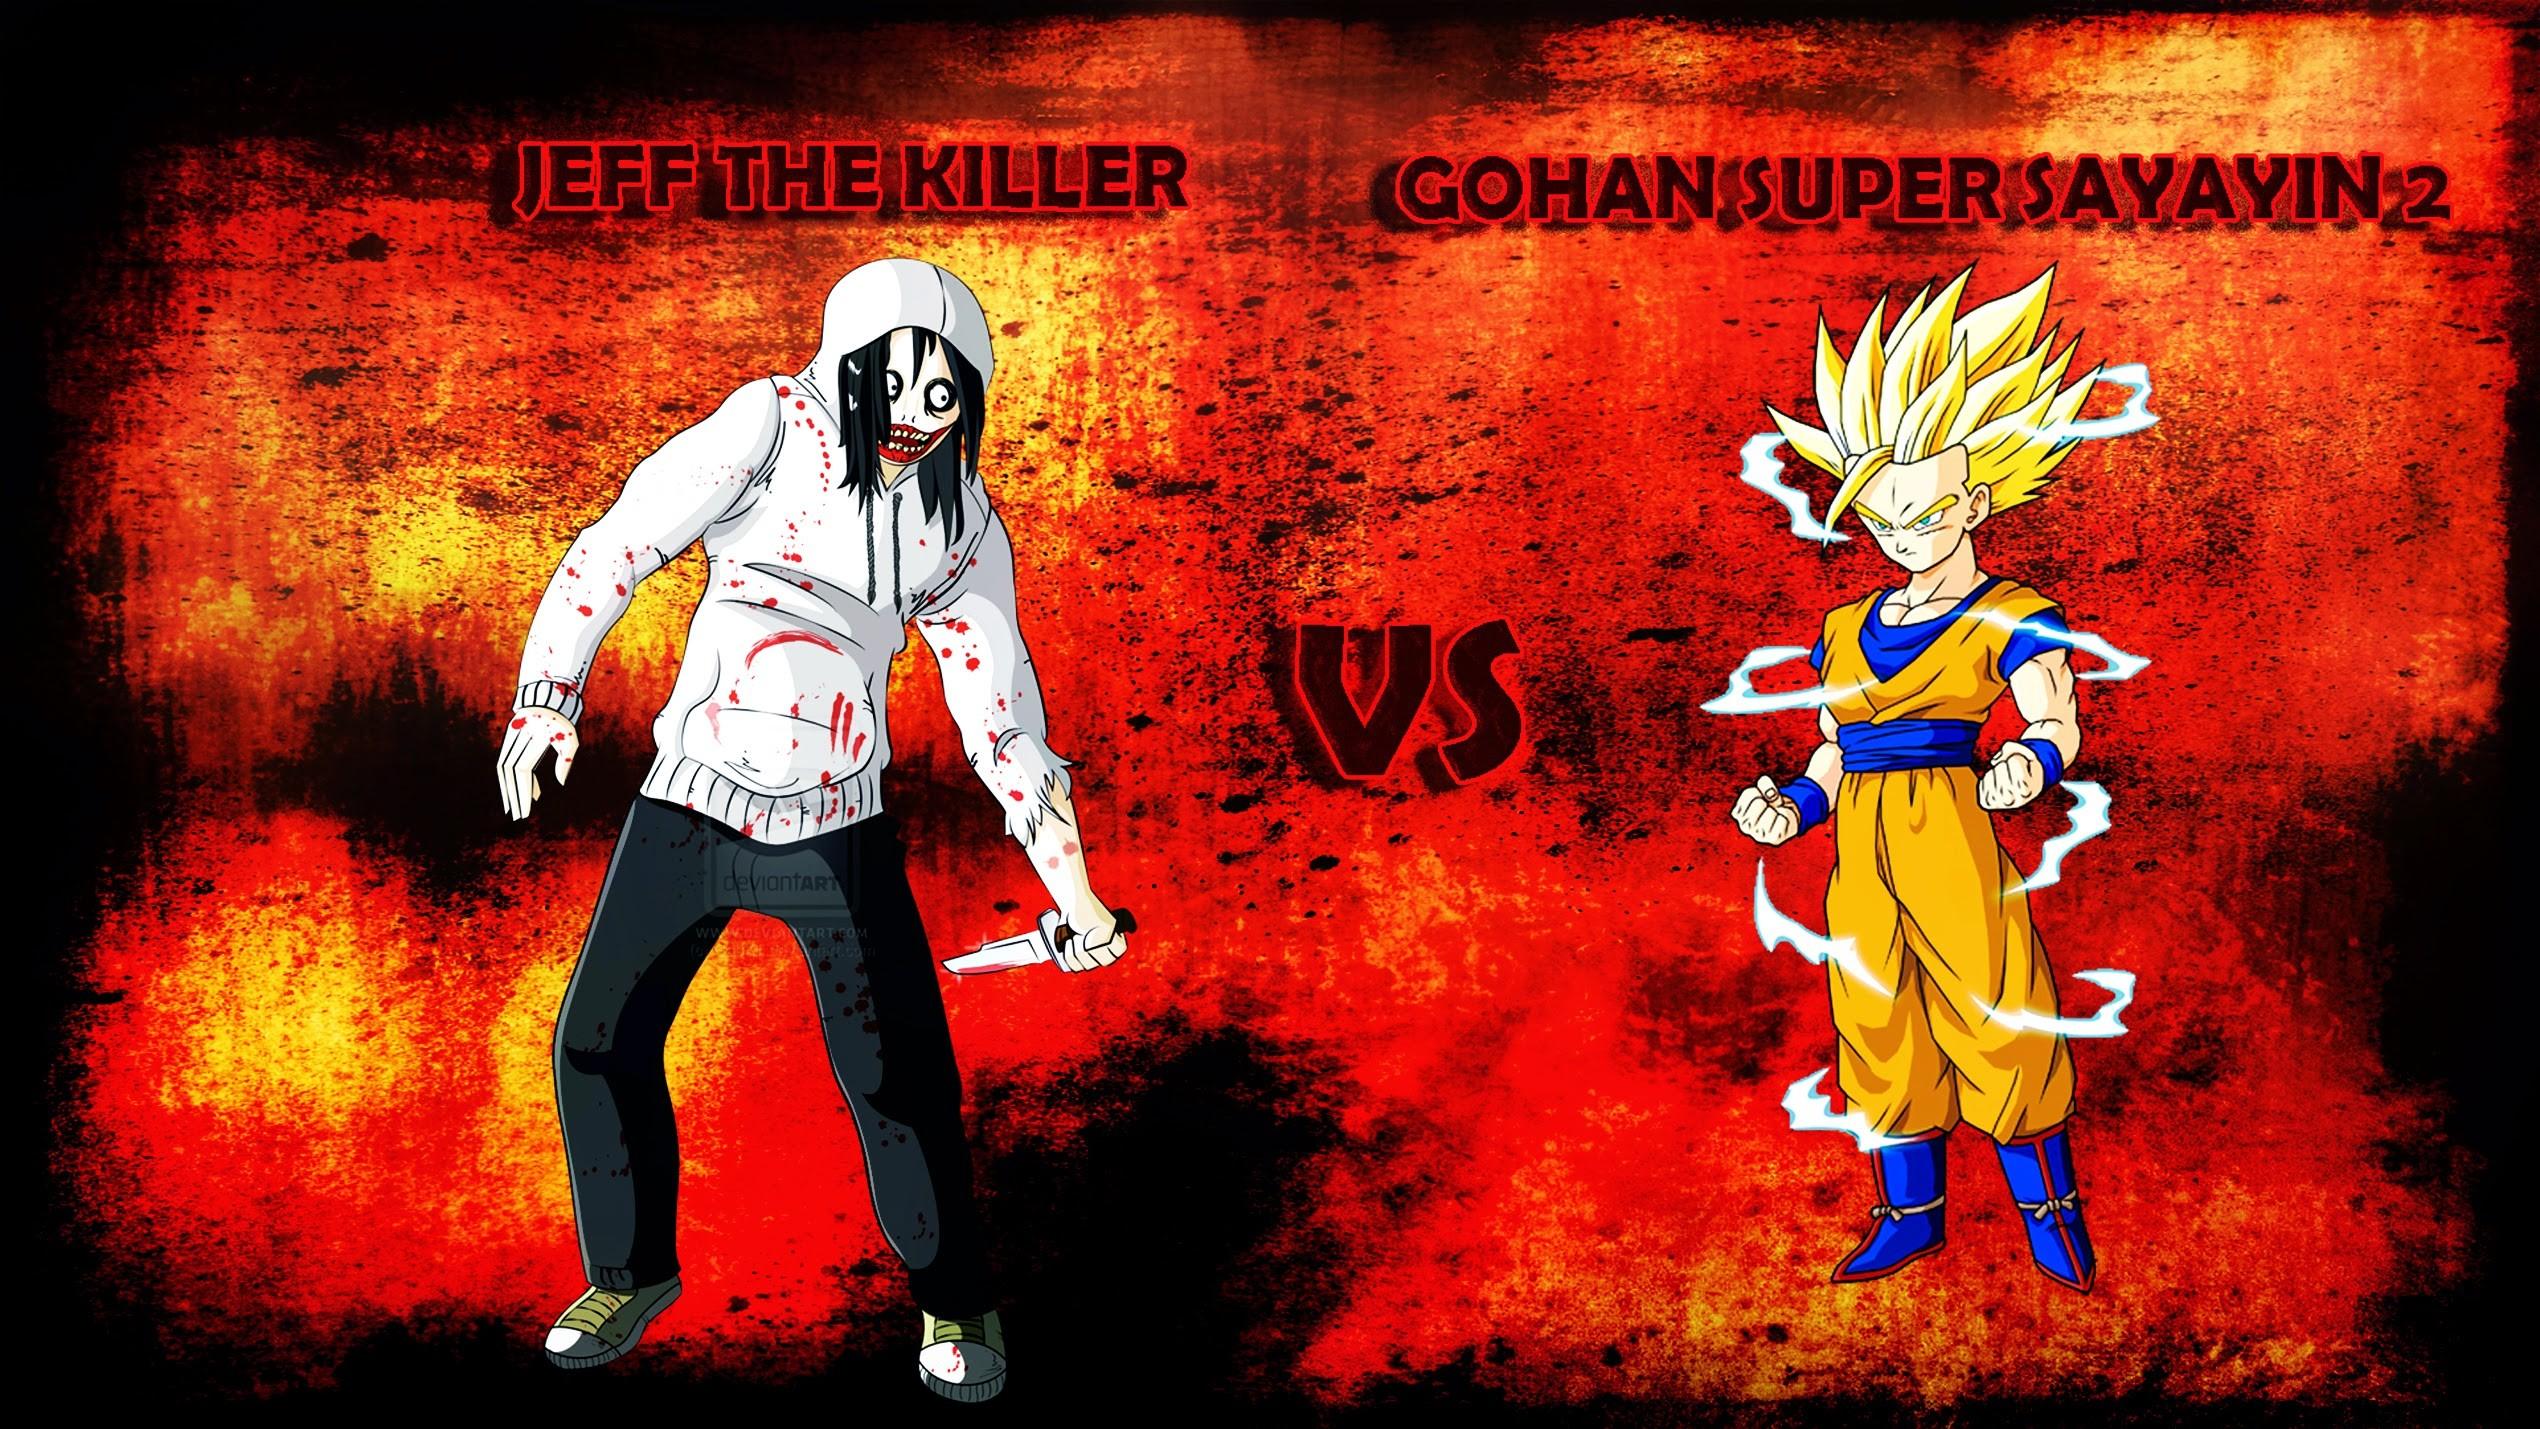 … Jeff the Killer vs Gohan Super Saiyan 2 [Wallpaper by TheWolfRomeo